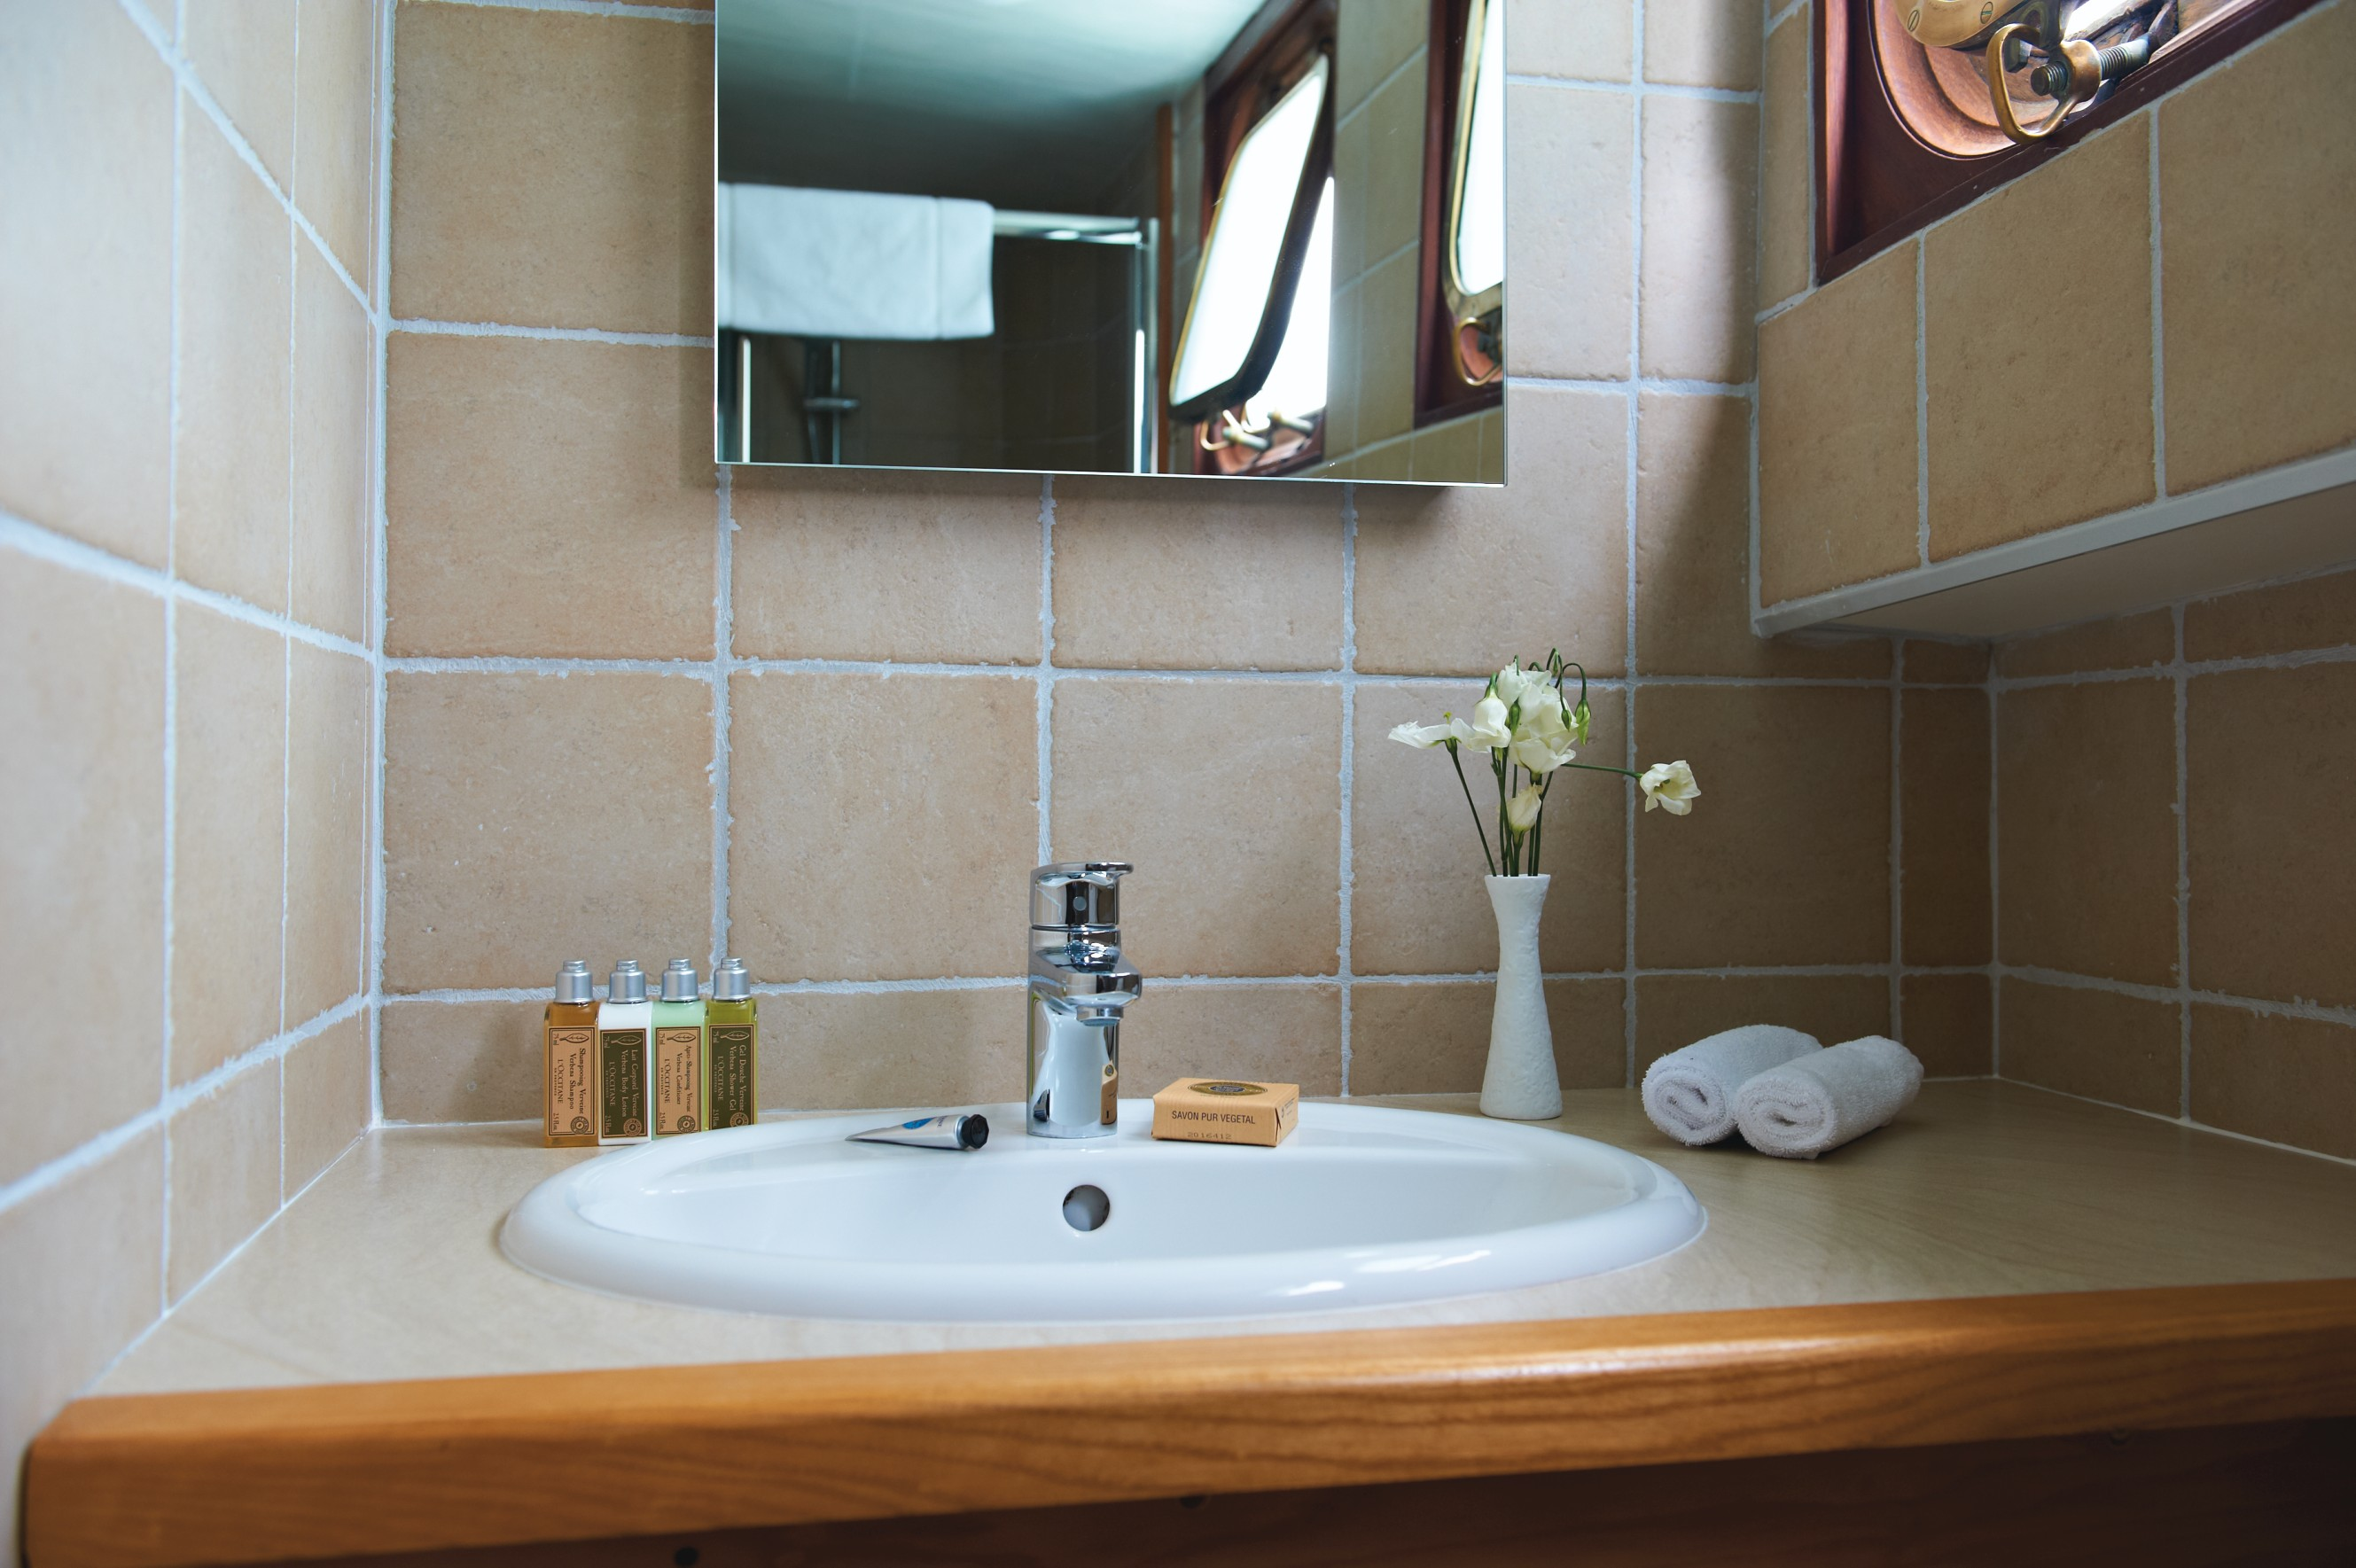 Belmond River Cruises Belmond Hirondelle Accommodation Bathroom.jpg